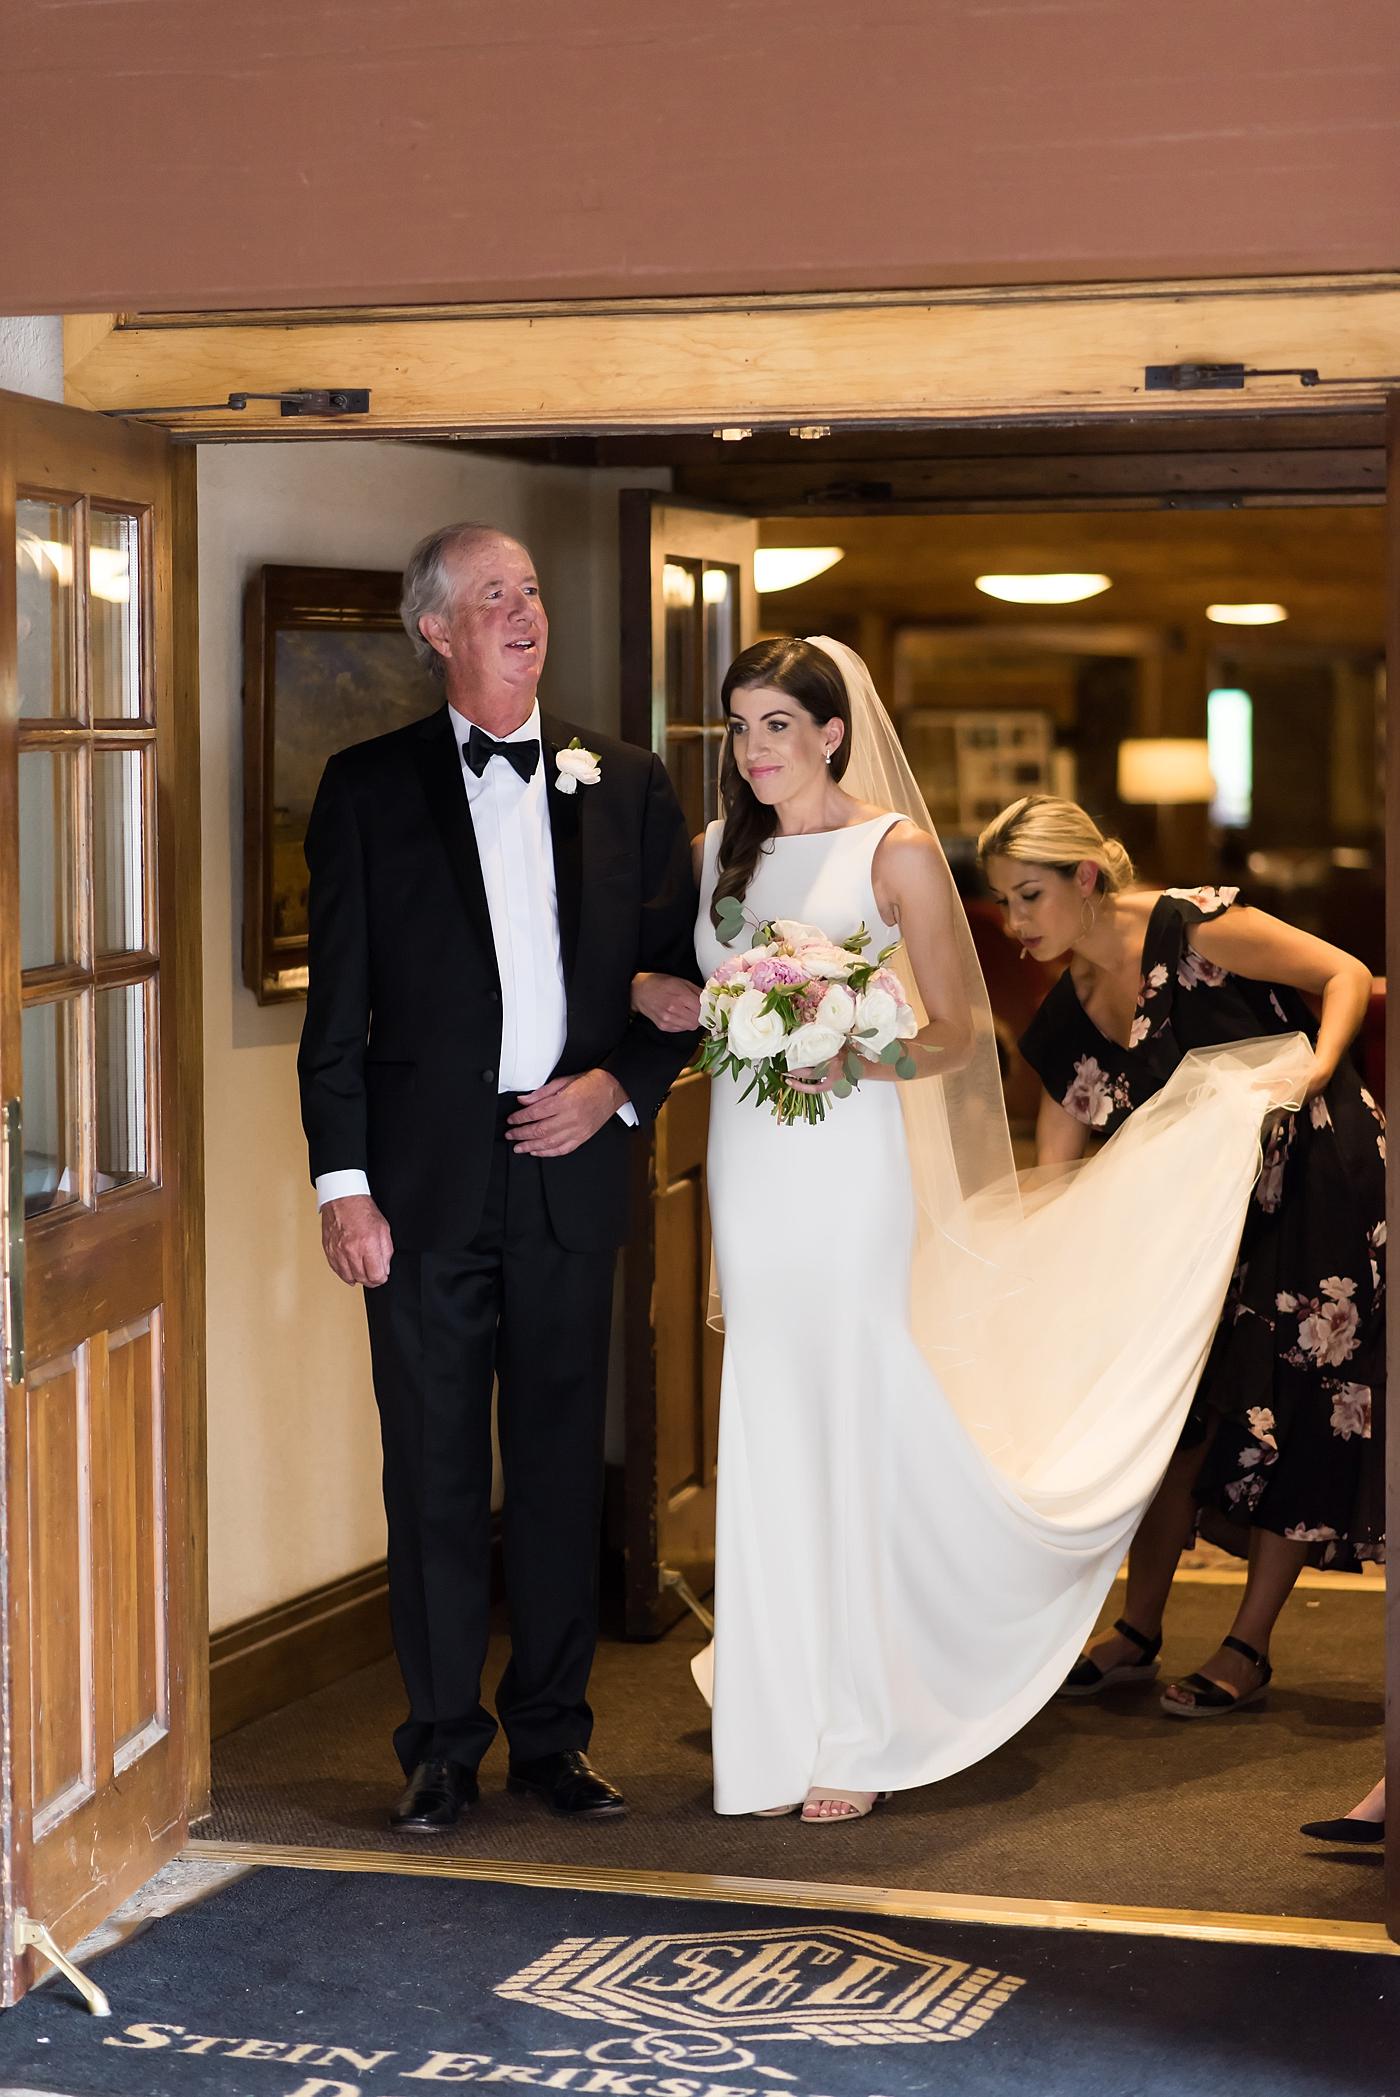 Romantic Mountain Wedding_Deer Valley Weddings_Park City Wedding Planner_MelissaFancy_0090.jpg